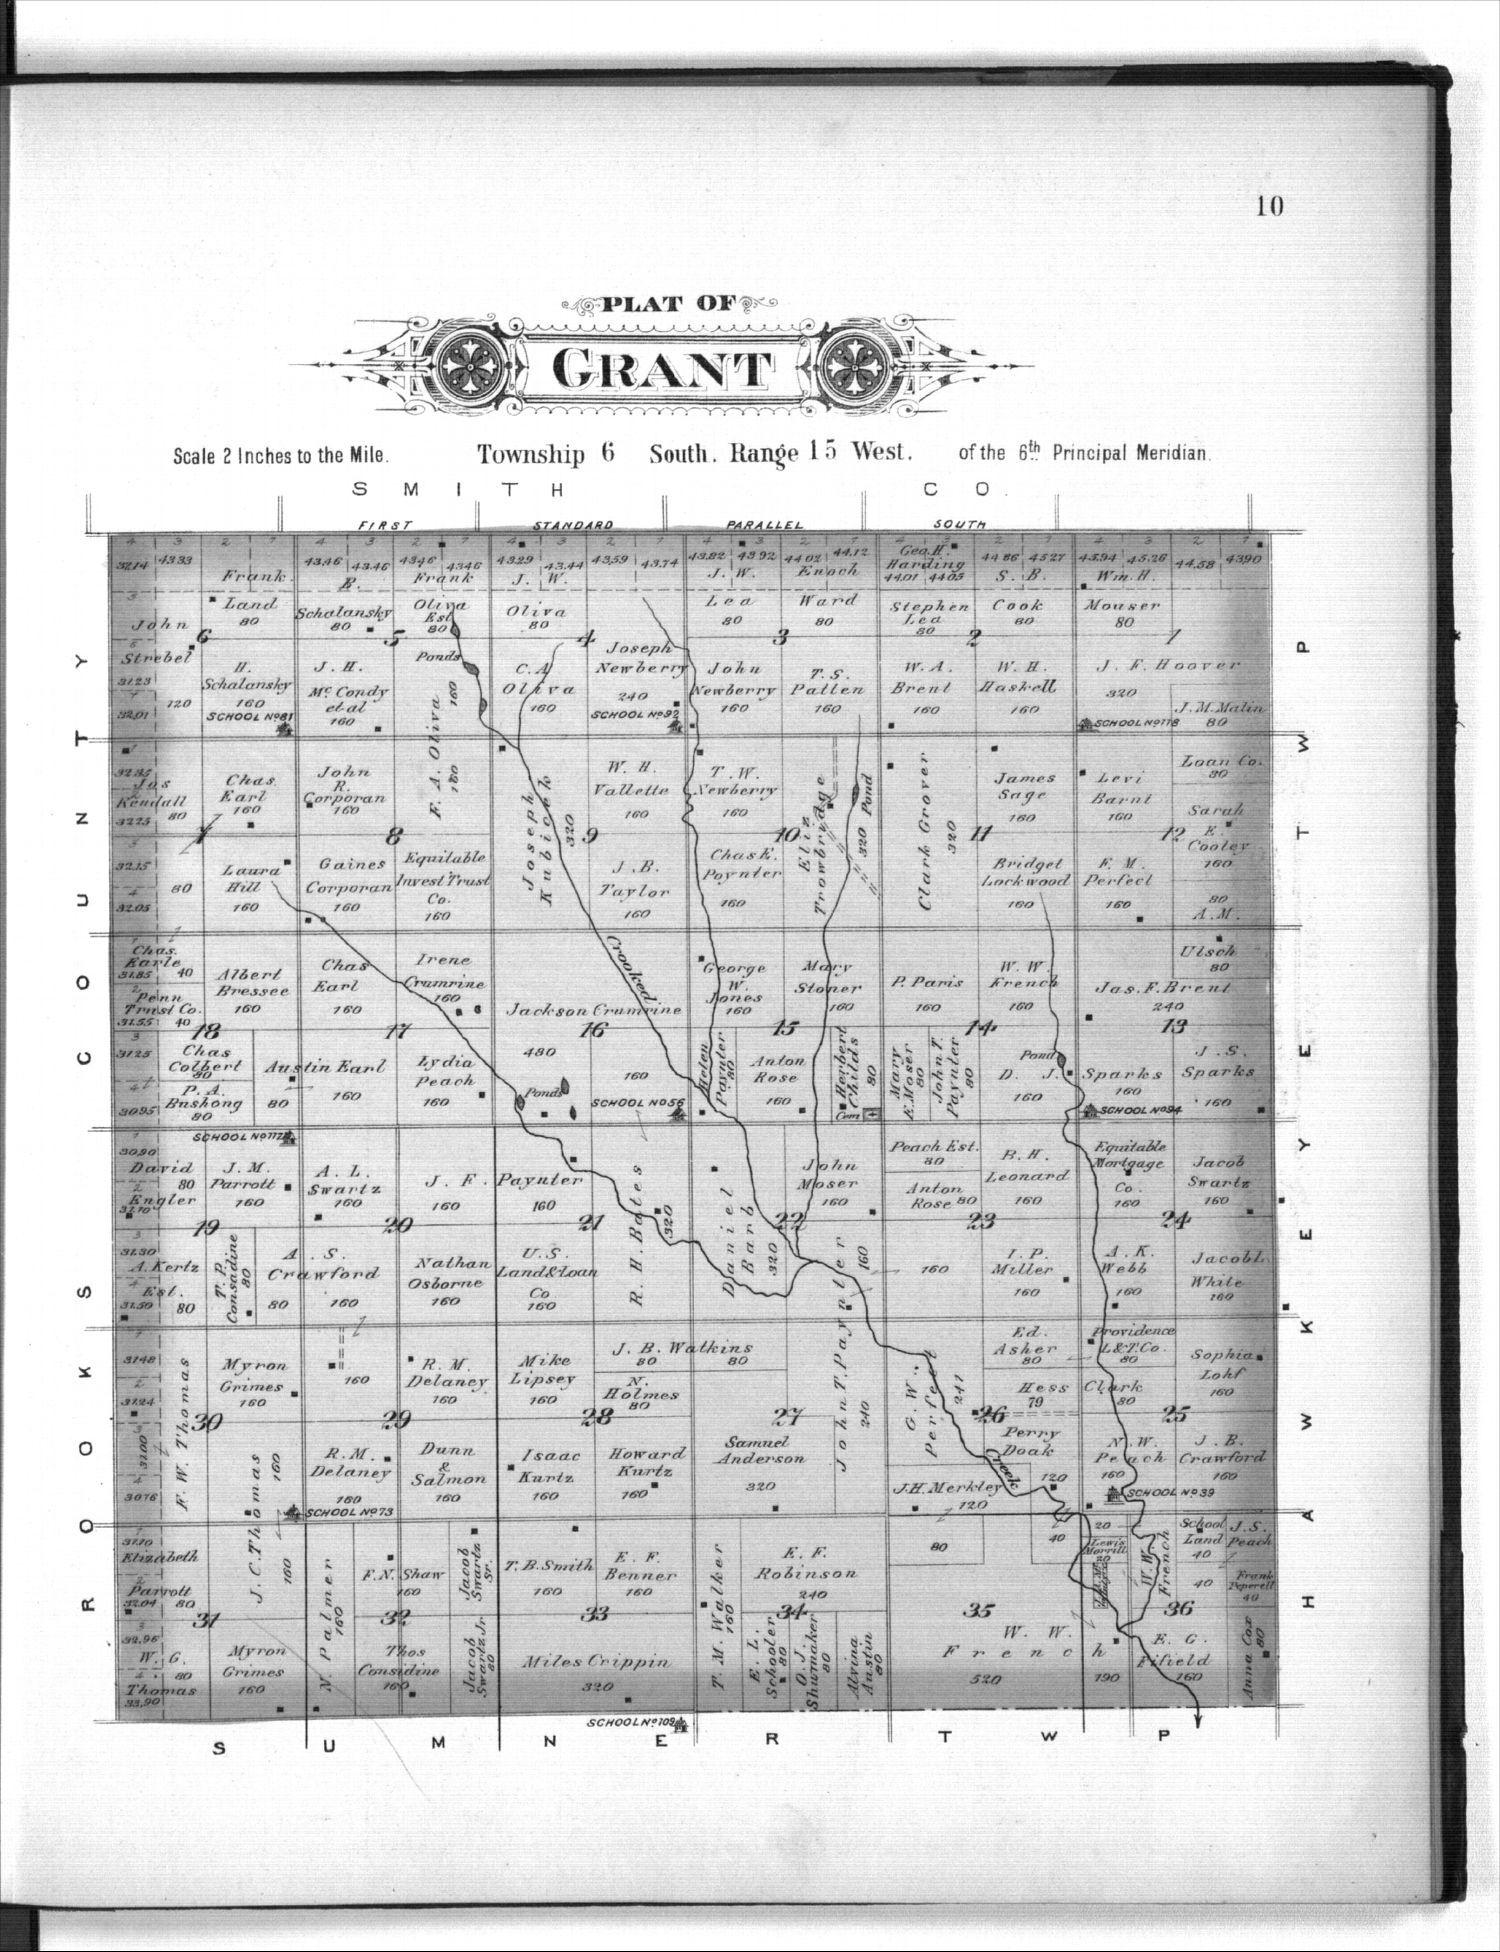 Plat book of Osborne County, Kansas - 10